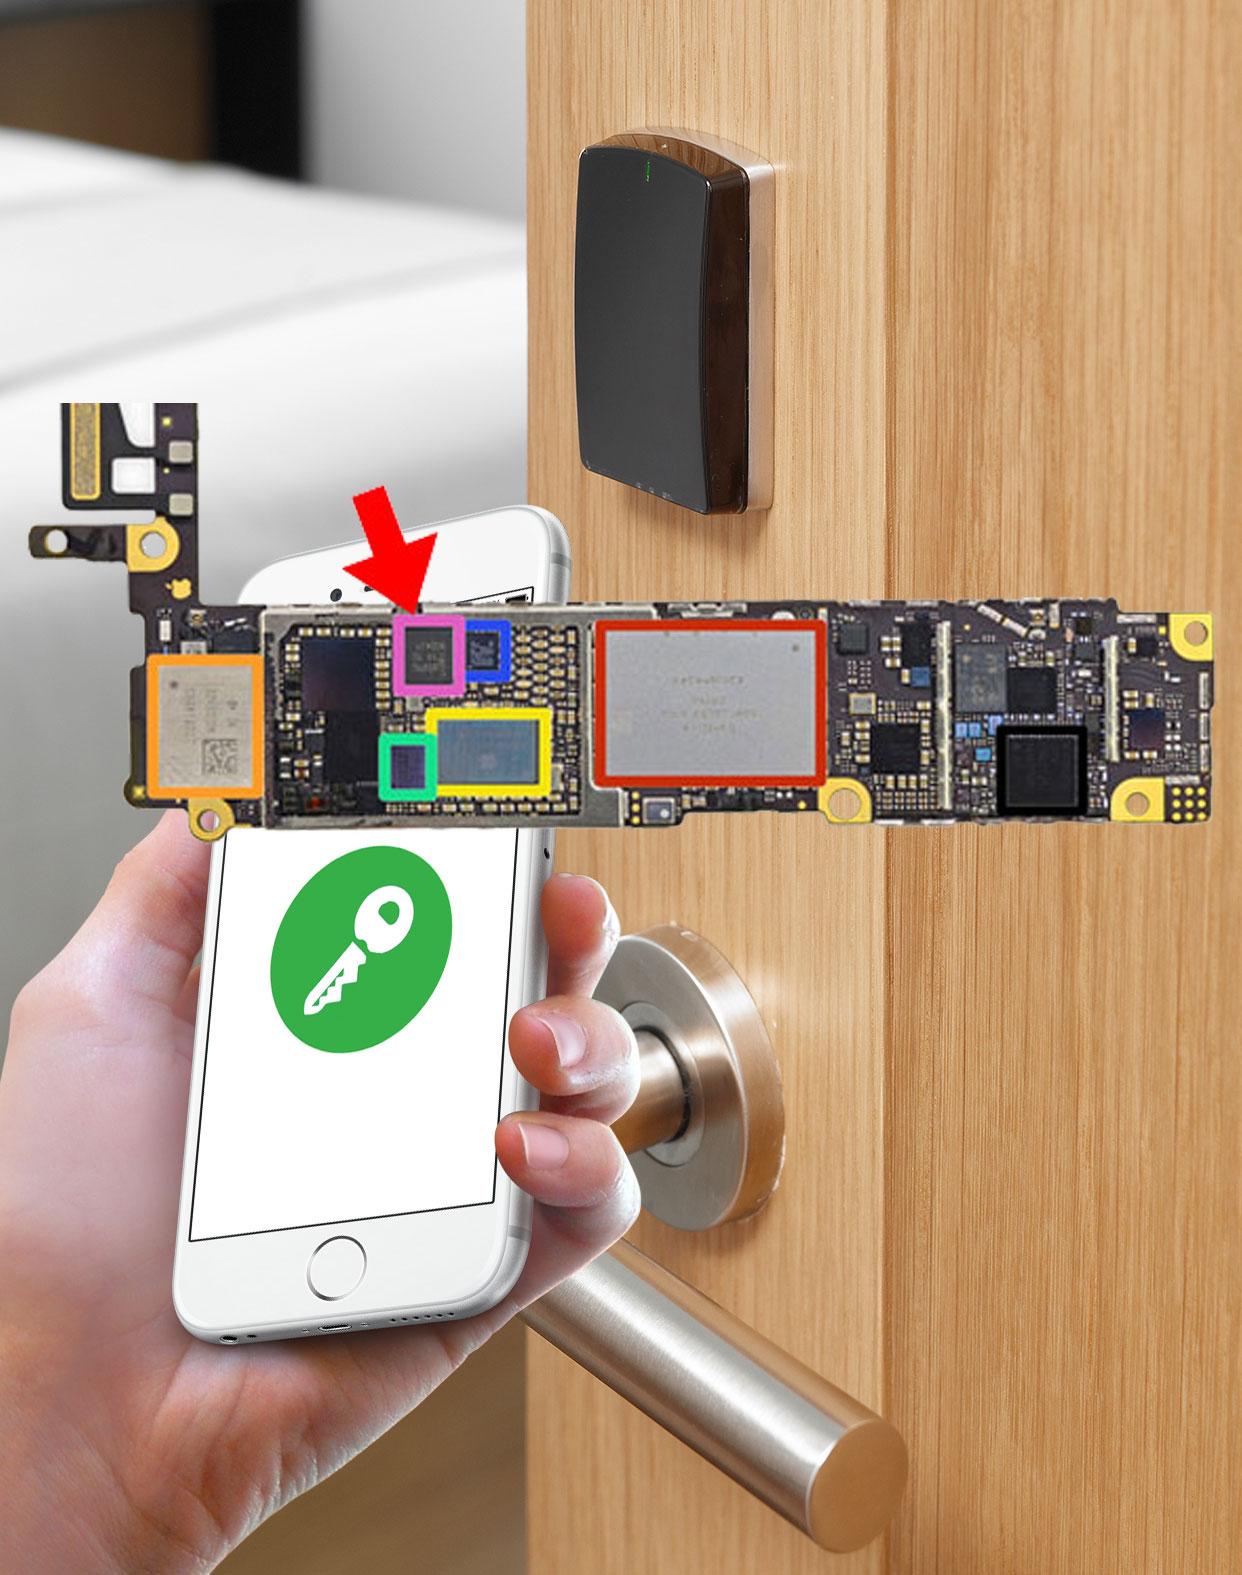 Chip NFC en el iPhone 6 para abrir la puerta de un hotel